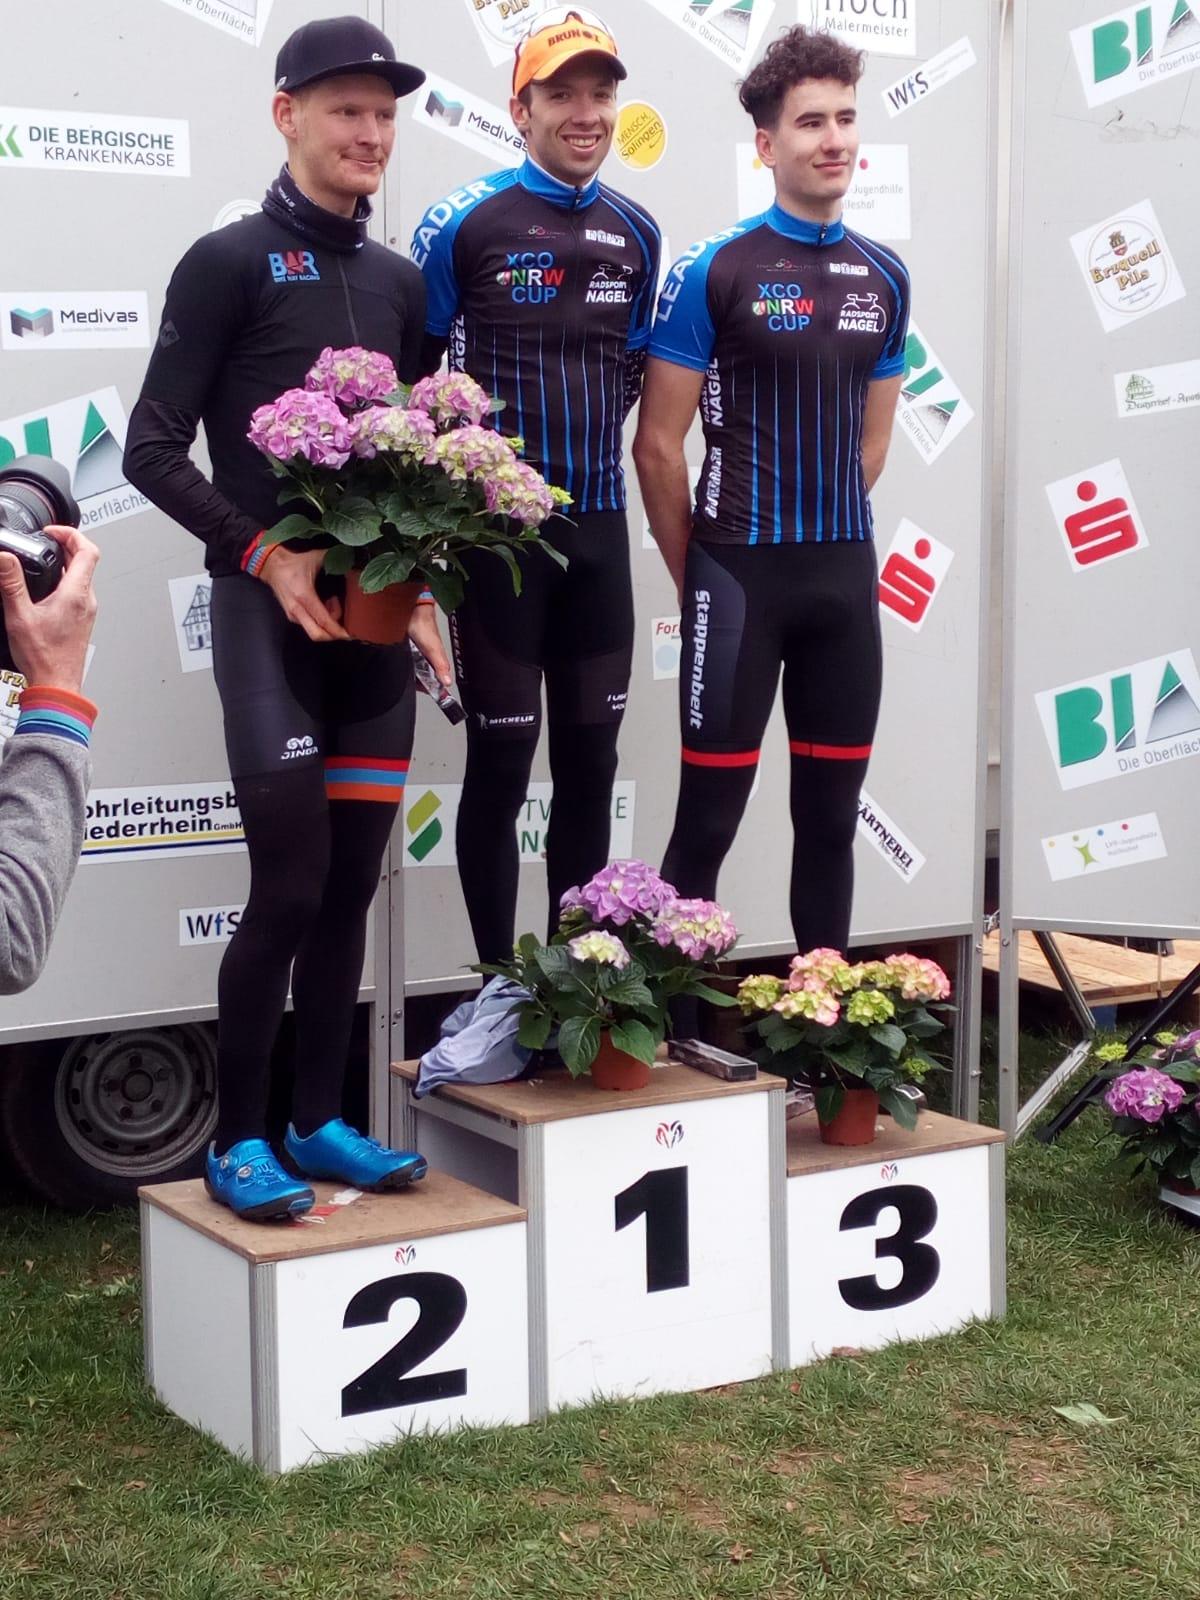 Martin Fanger wint 3Nationscup in Solingen